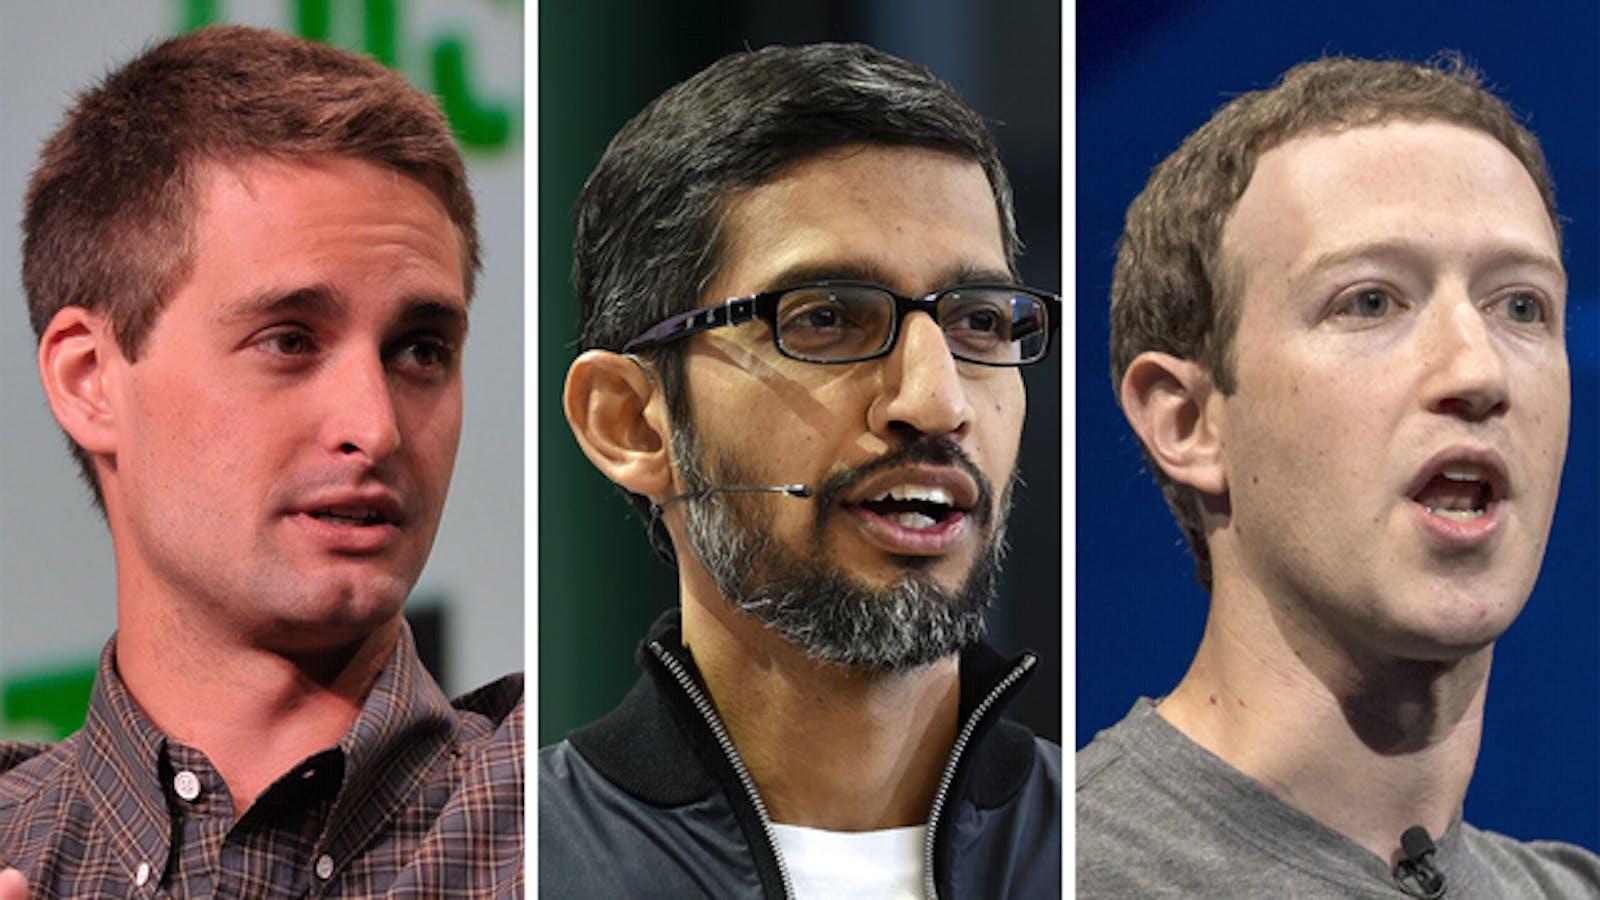 Snap's Evan Spiegel, Google's Sundar Pichai and Facebook's Mark Zuckerberg. Photos by Flickr/TechCrunch; Bloomberg.